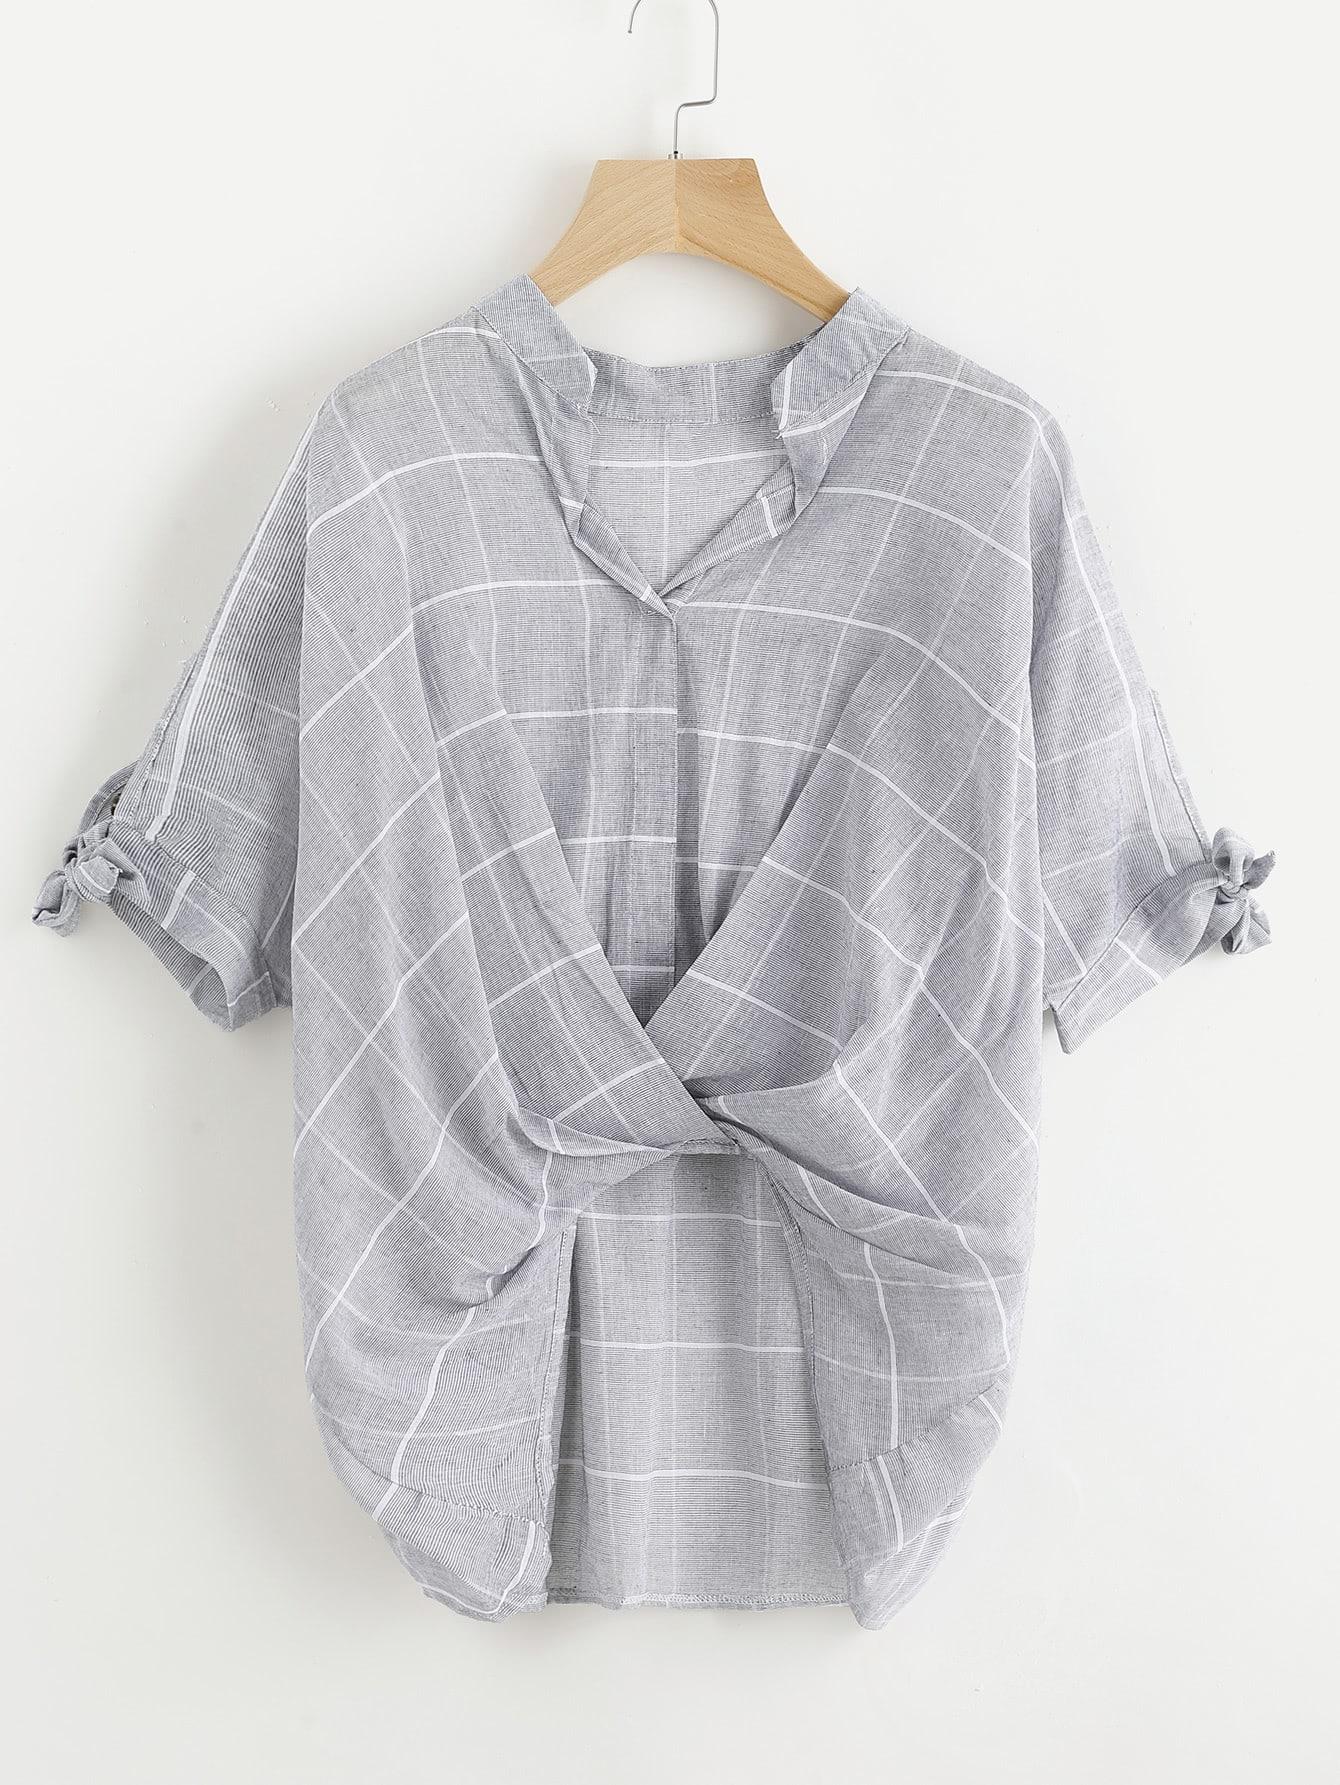 f4cc9bc4a6c262 KOZ1.com | Shop for latest women's fashion dresses, tops, bottoms.